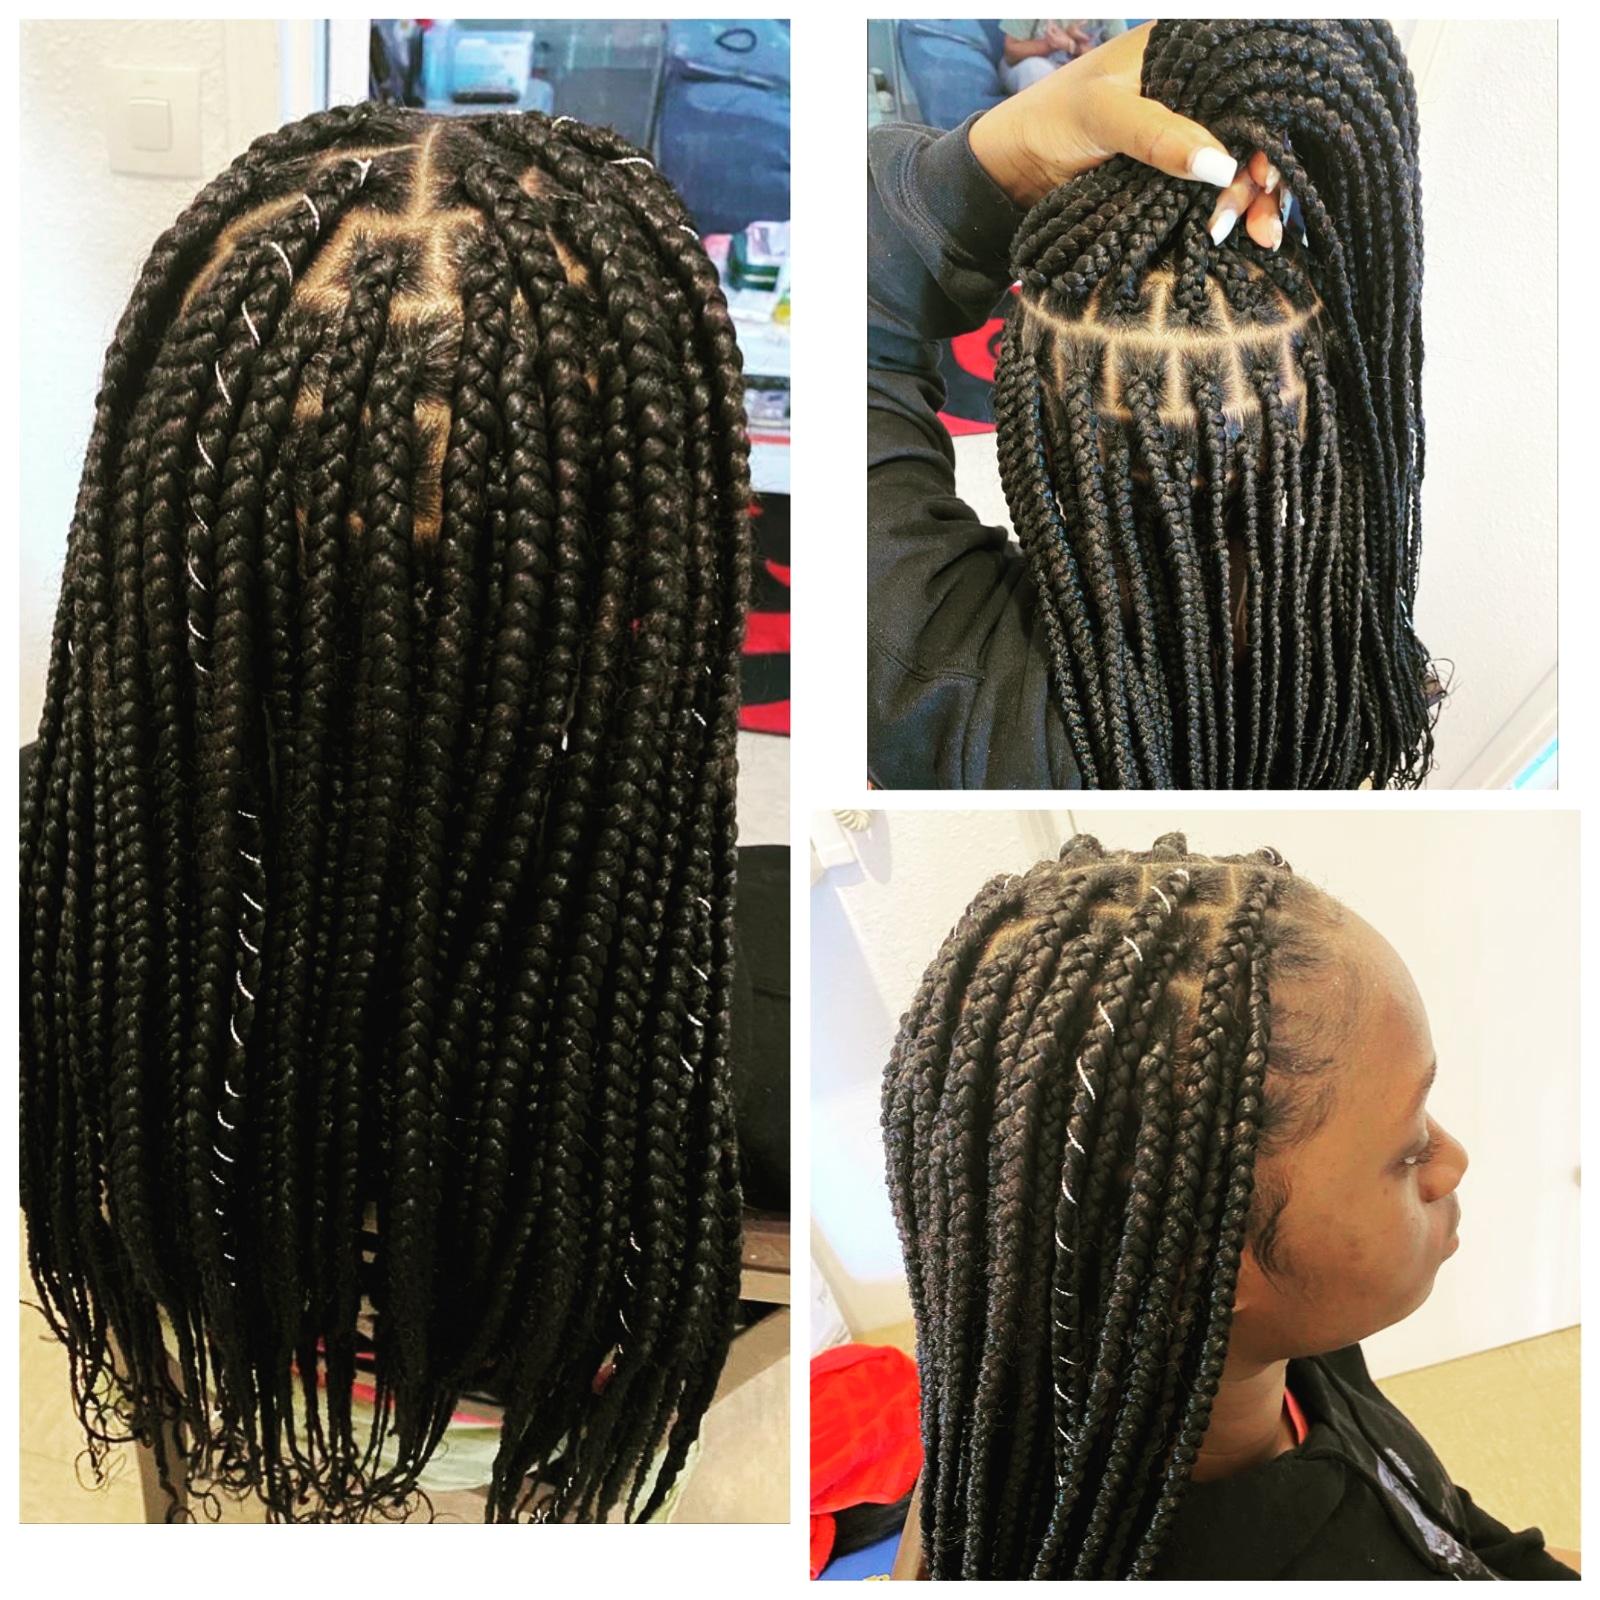 salon de coiffure afro tresse tresses box braids crochet braids vanilles tissages paris 75 77 78 91 92 93 94 95 IBKOOXRA